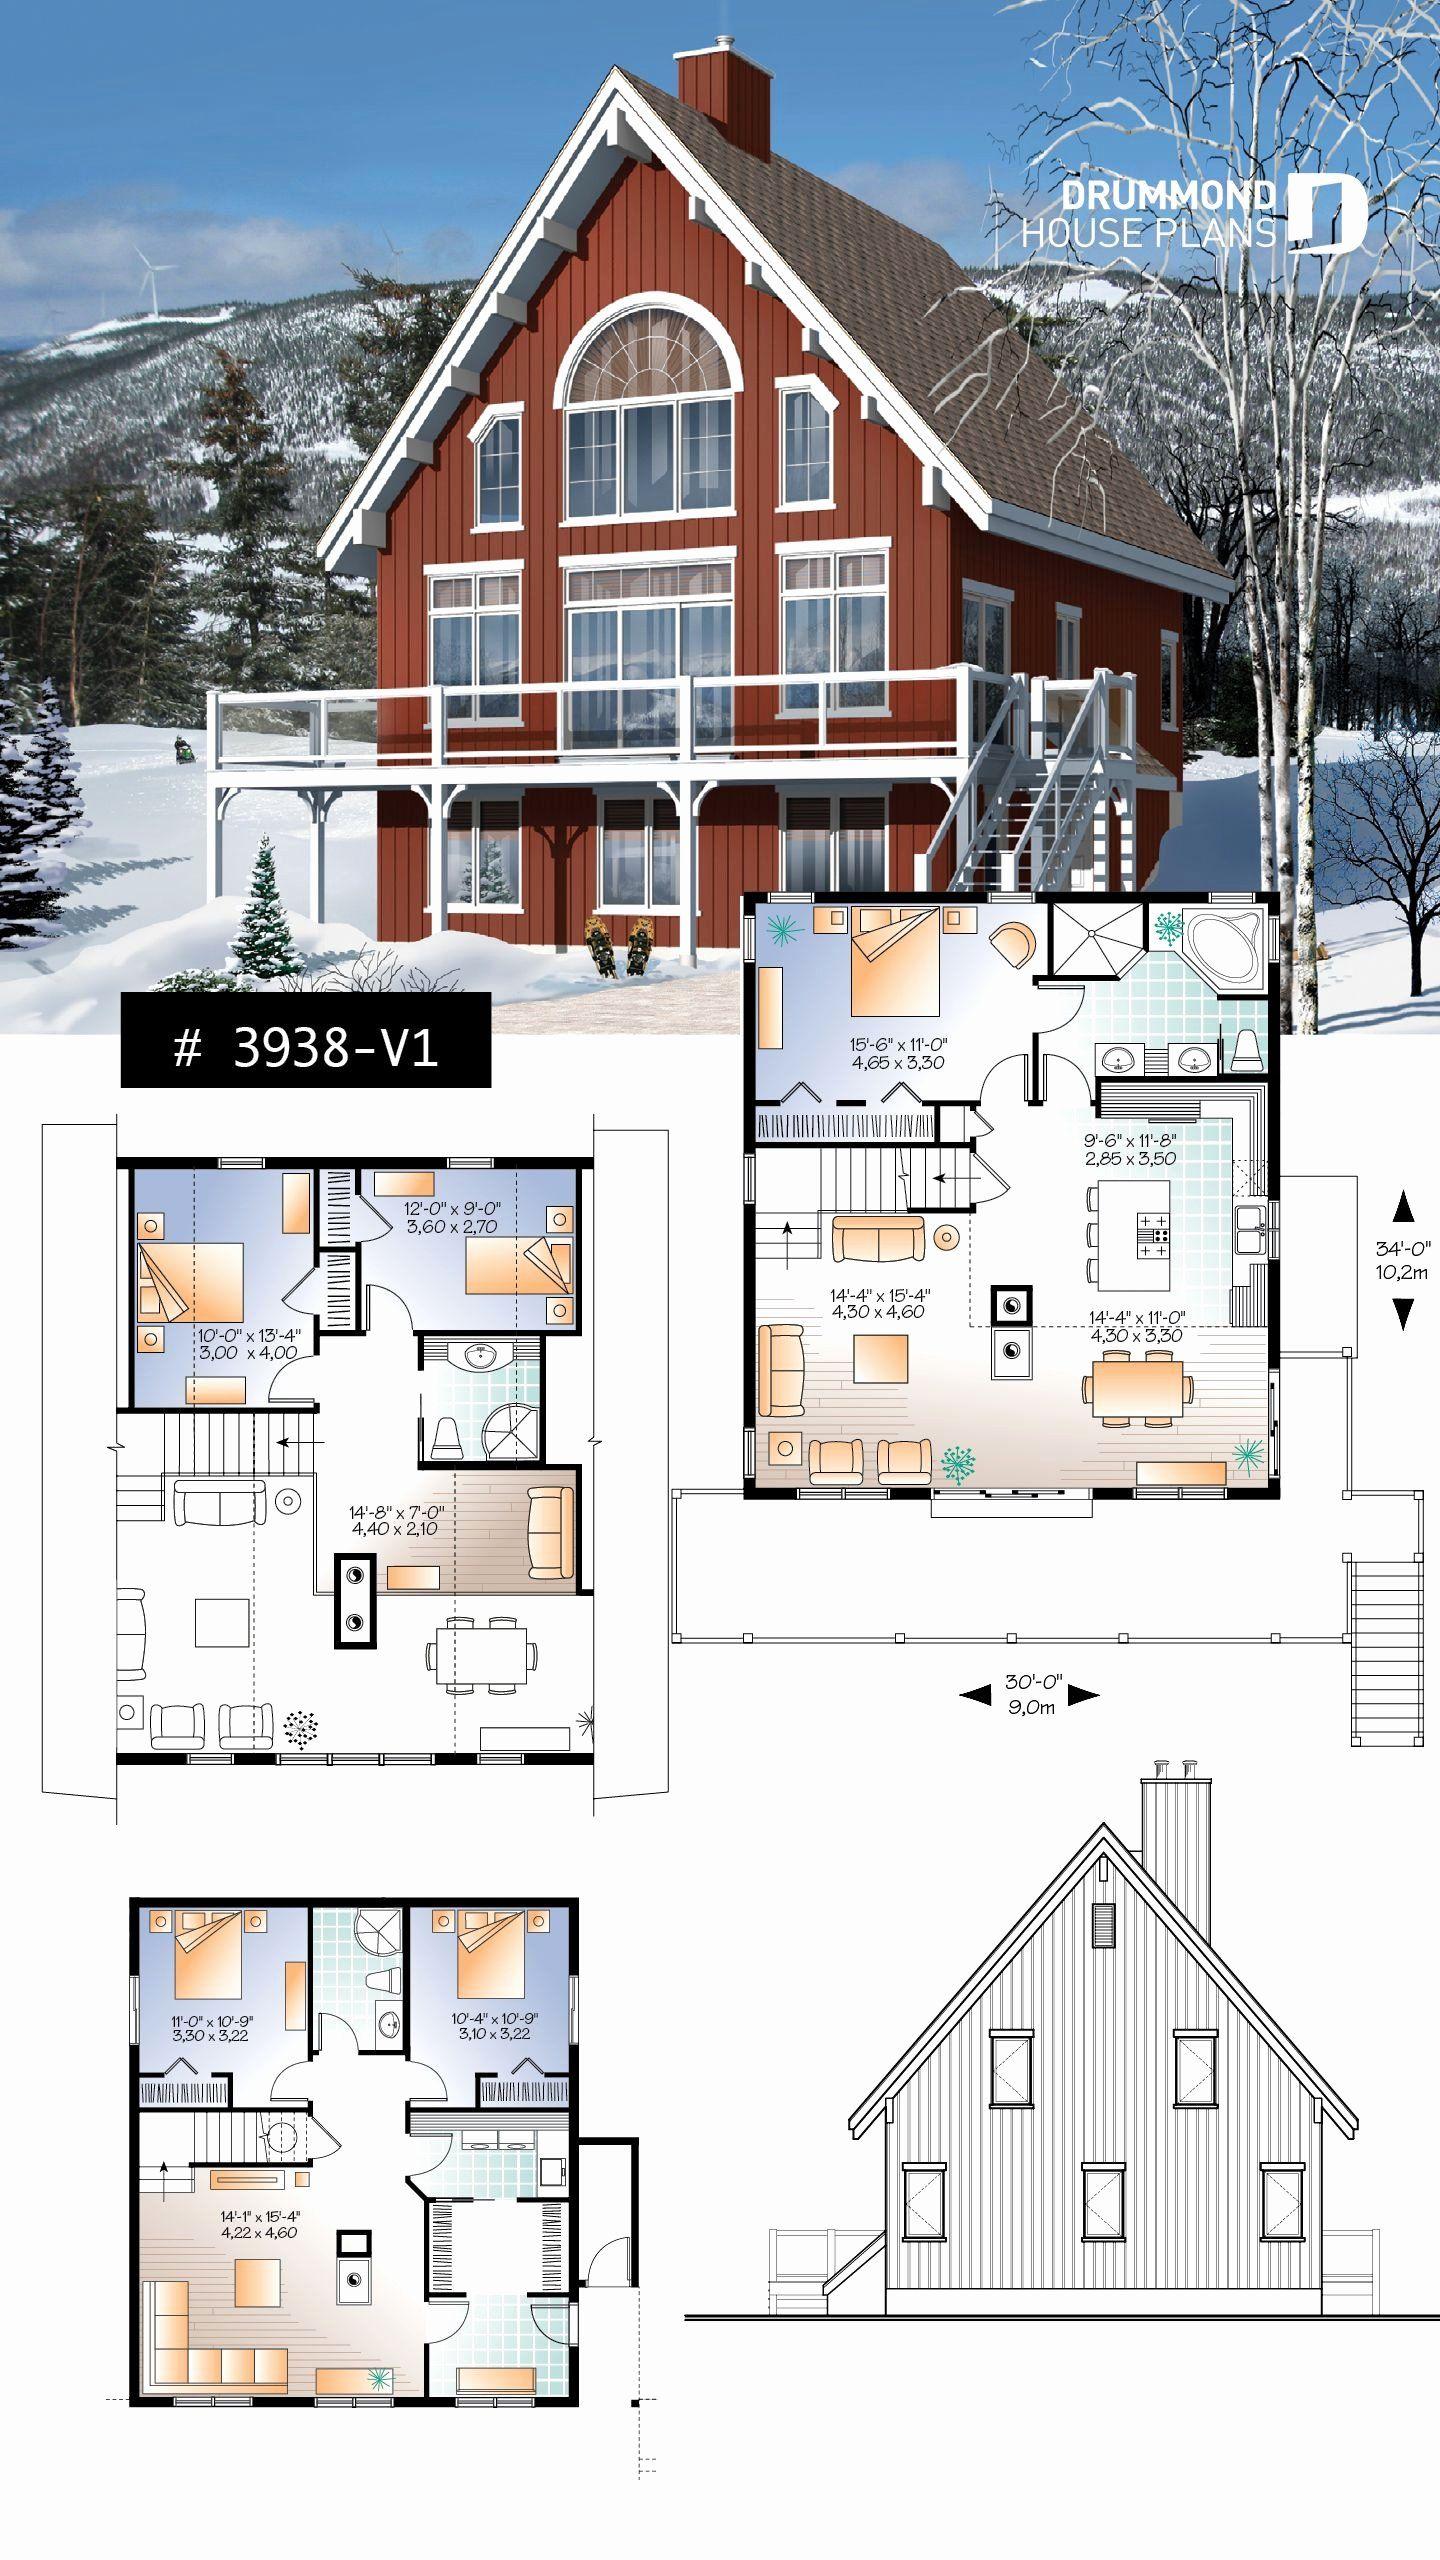 5 Bedroom Lake House Plans Fresh 5 Bedroom Rustic Chalet A Frame House Plan Open Living Cottage Plan Lake House Plans Sims House Plans